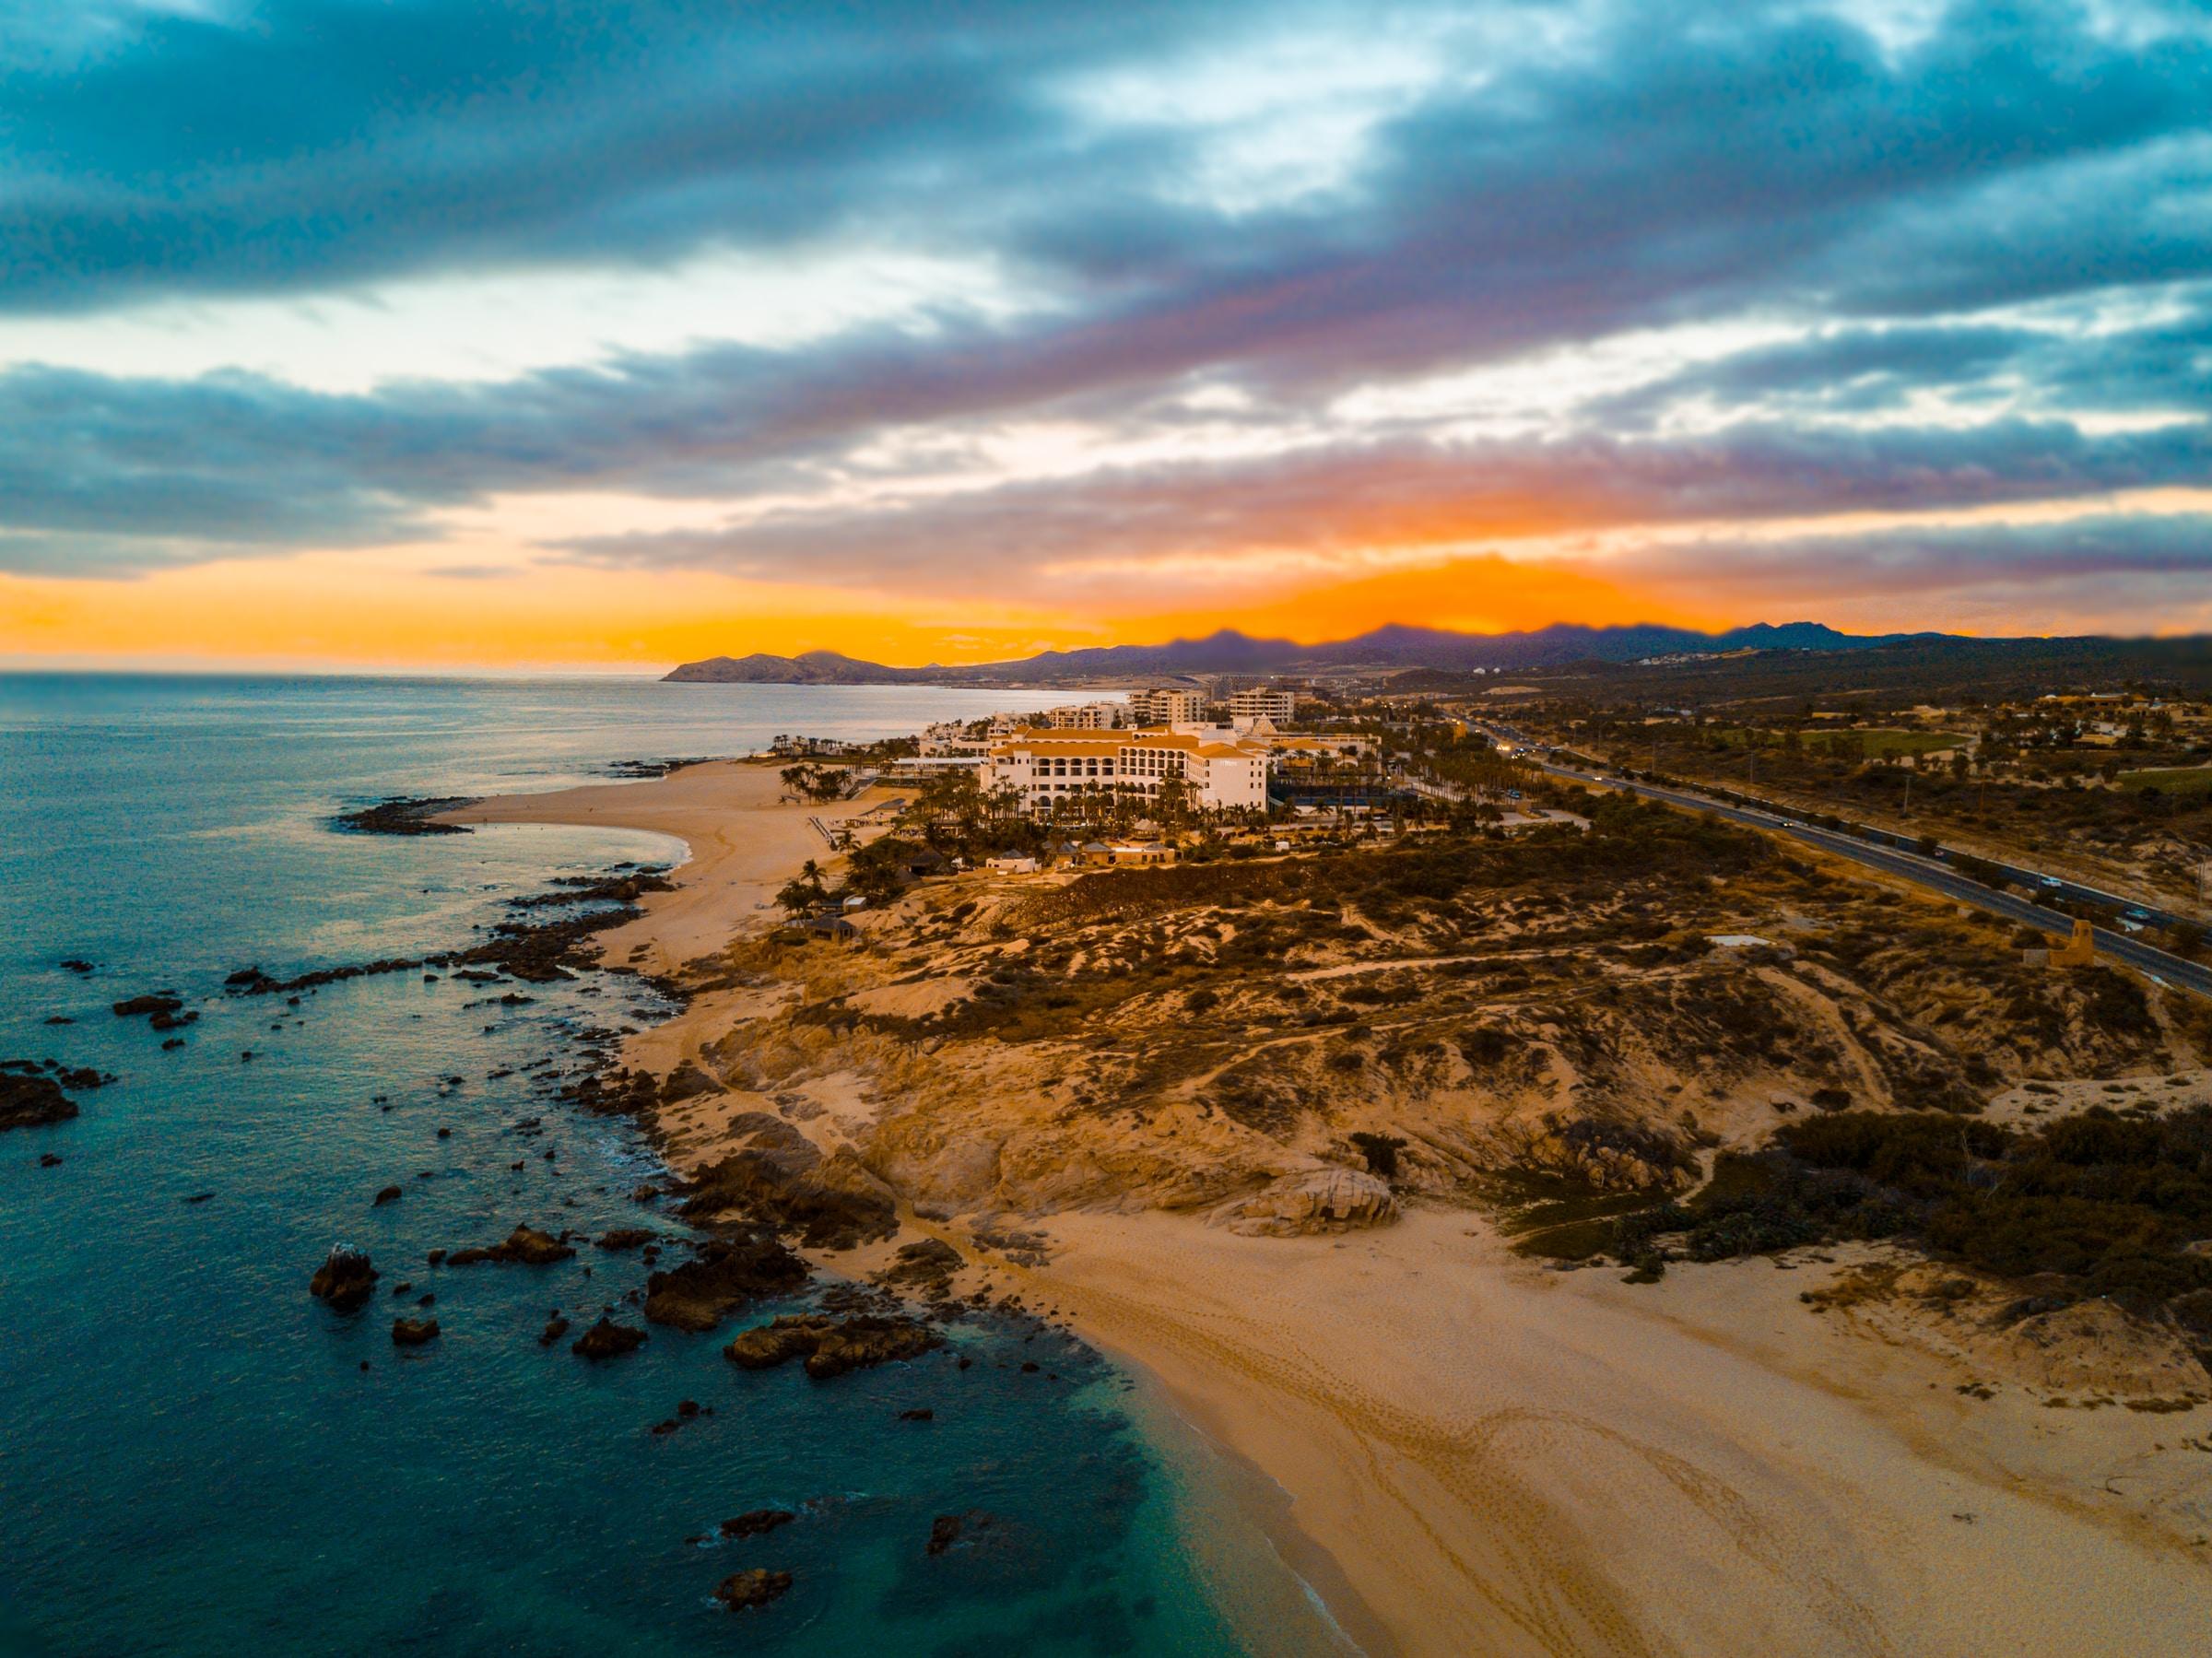 An orange sunset over a quiet coastal beach in San José del Cabo